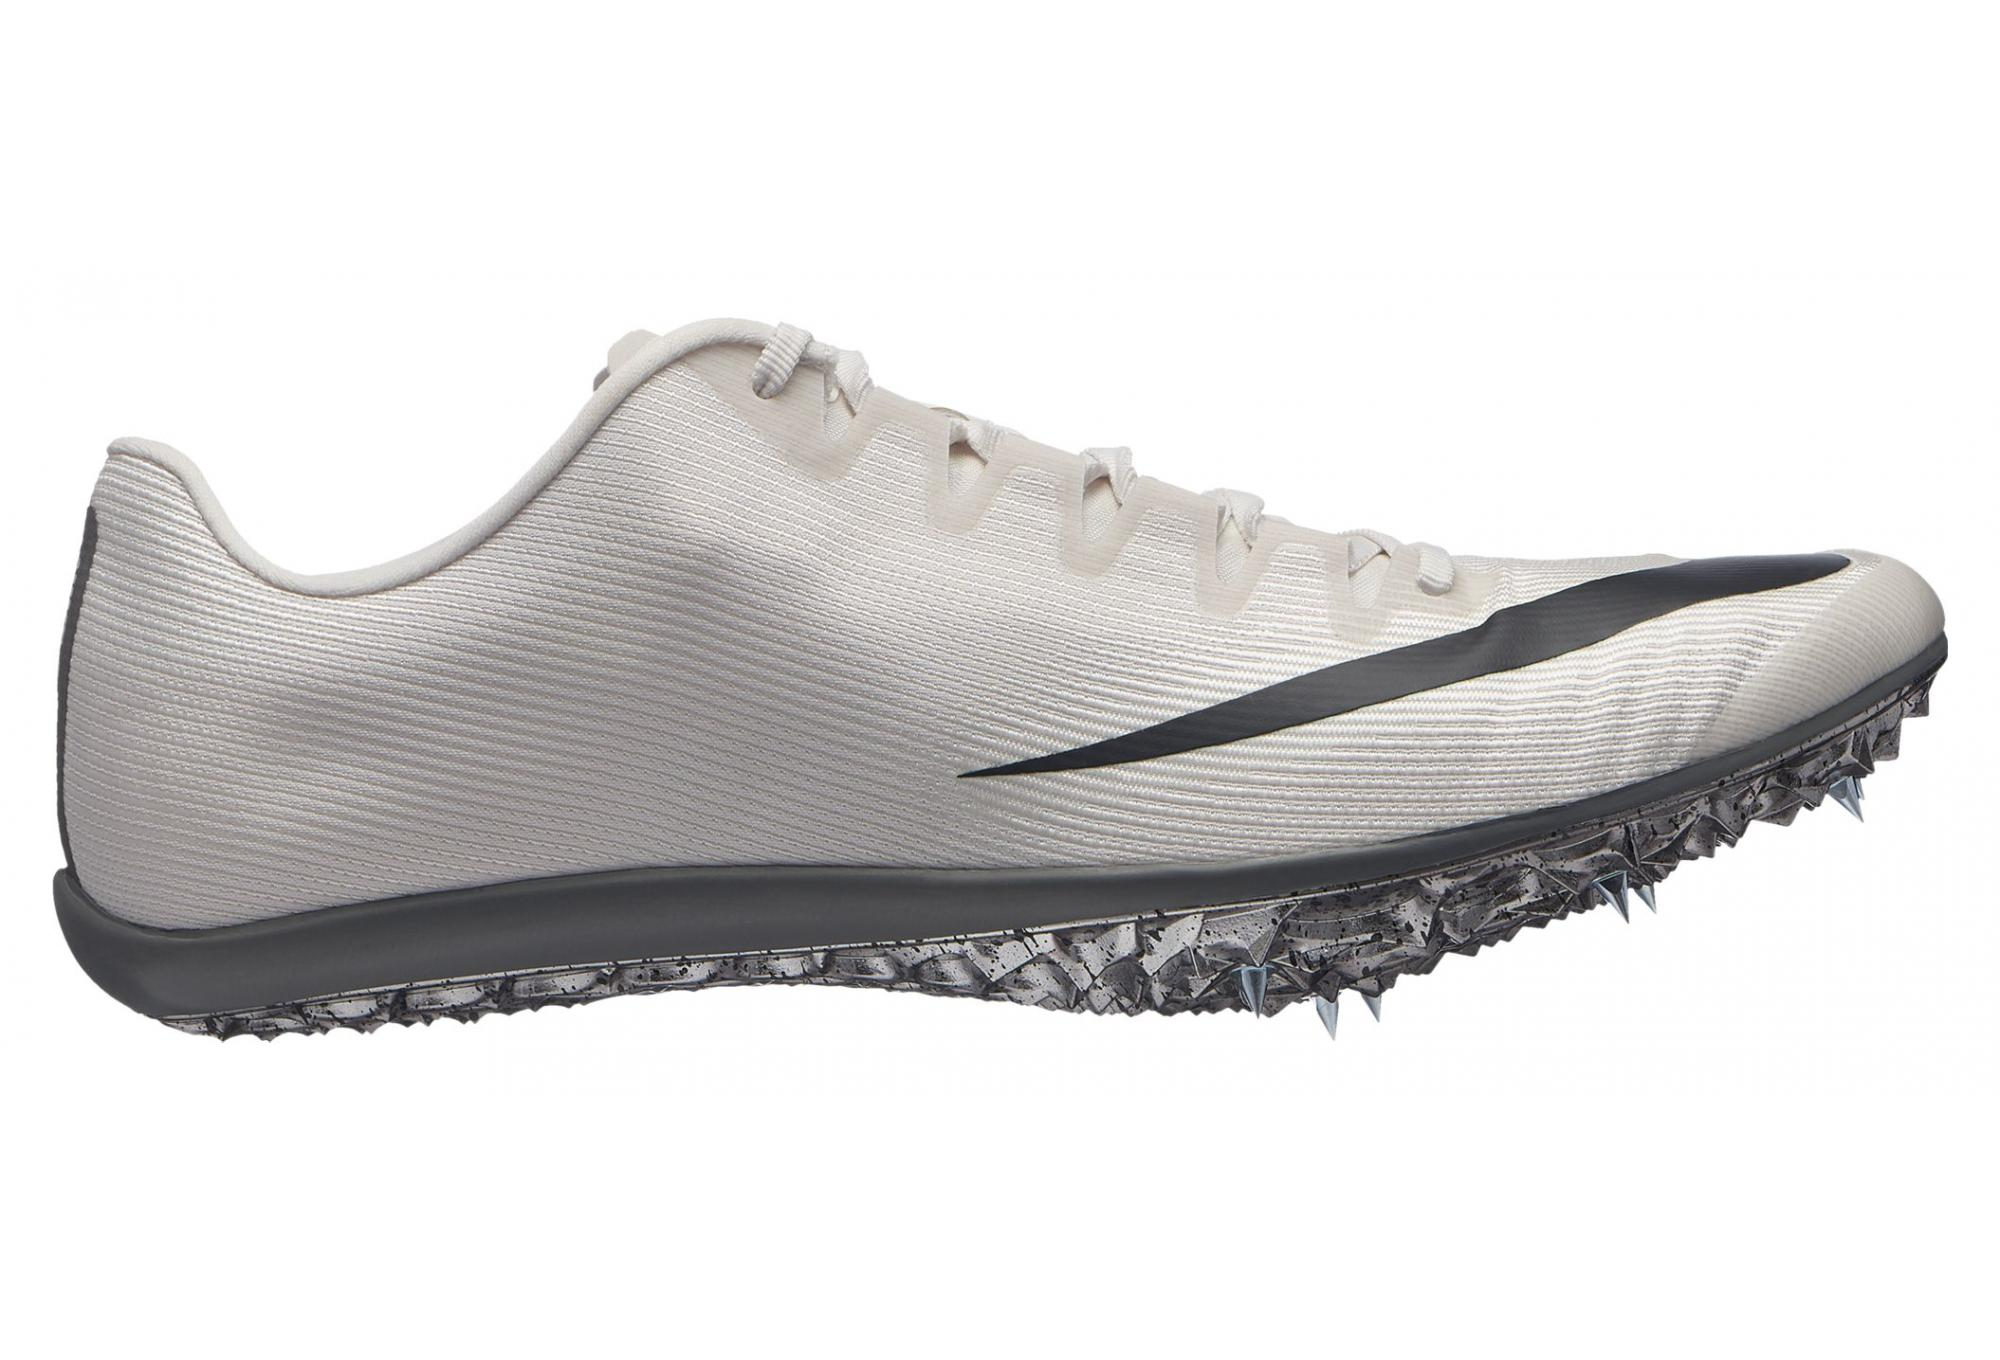 chaussure athletisme pointe nike